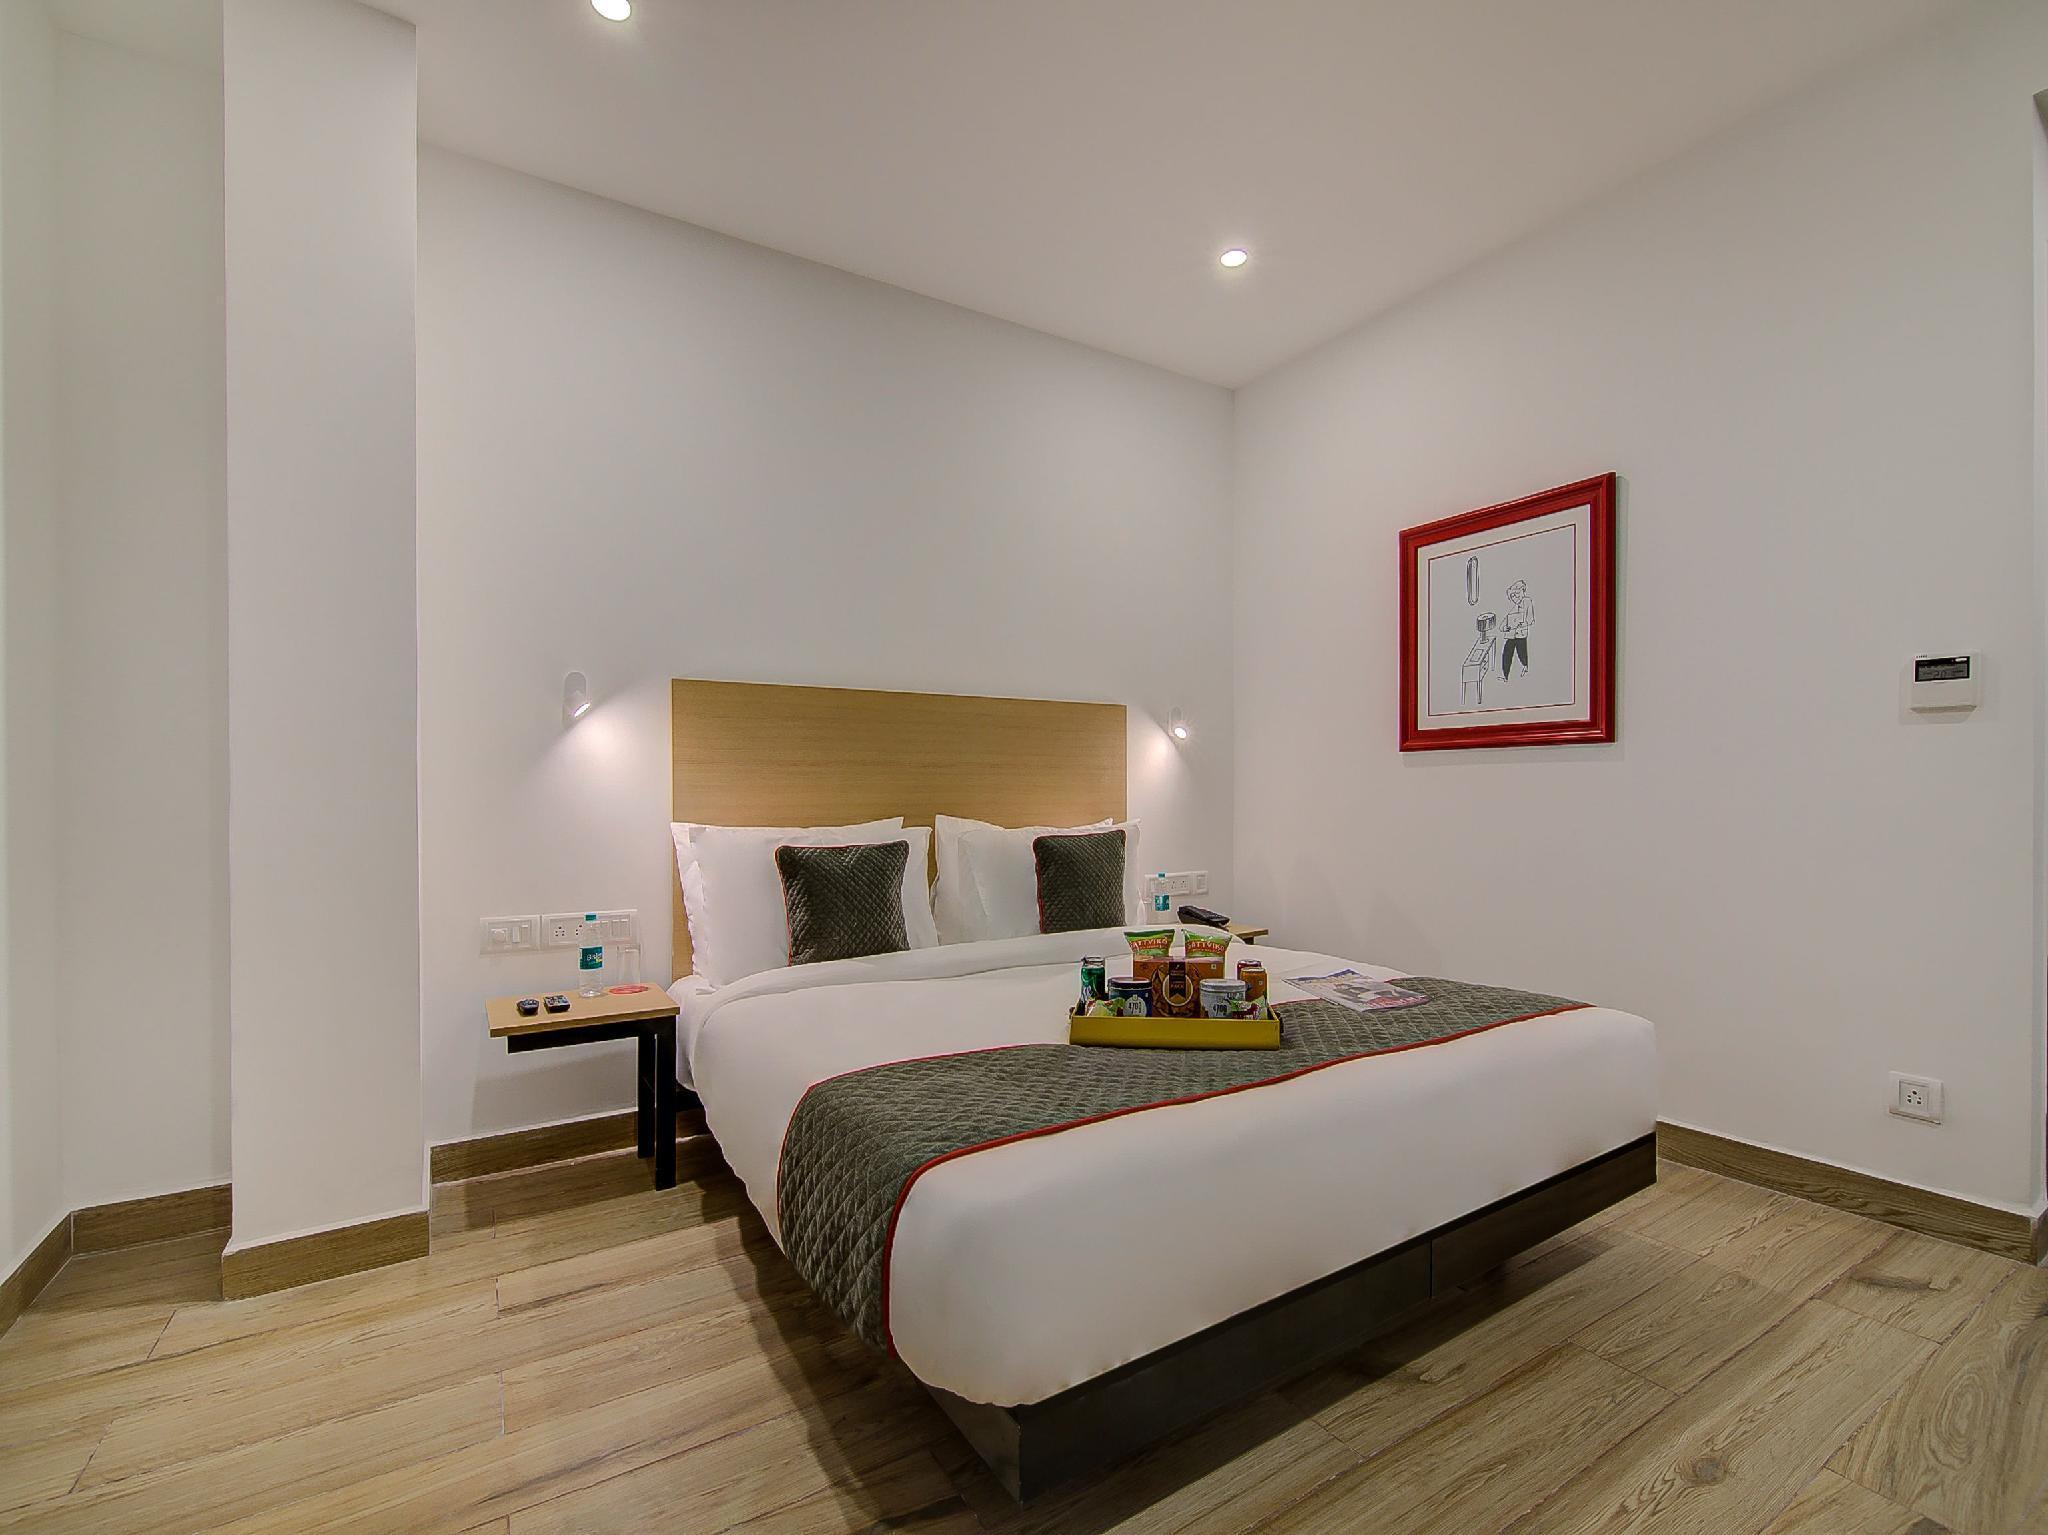 Oyo Townhouse 038 Banaswadi 100ft Road In Bangalore Room